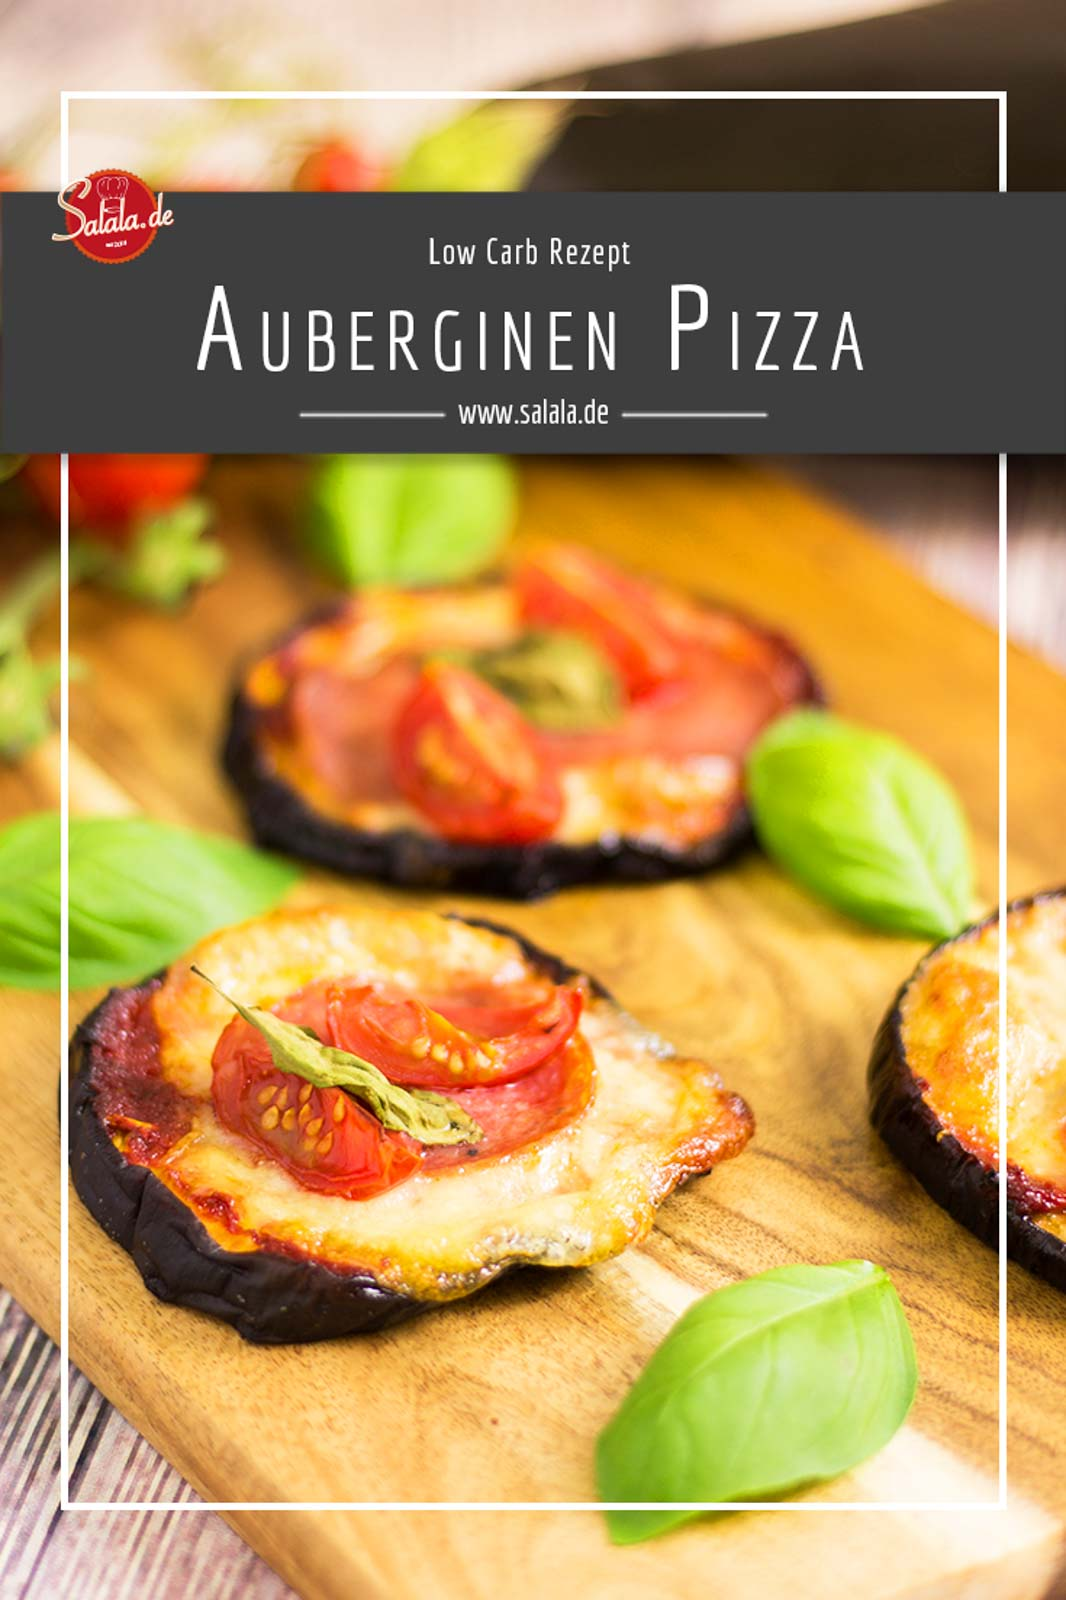 Low Carb Minipizza mit Auberginen! | salala.de – Low Carb mit Vroni ...